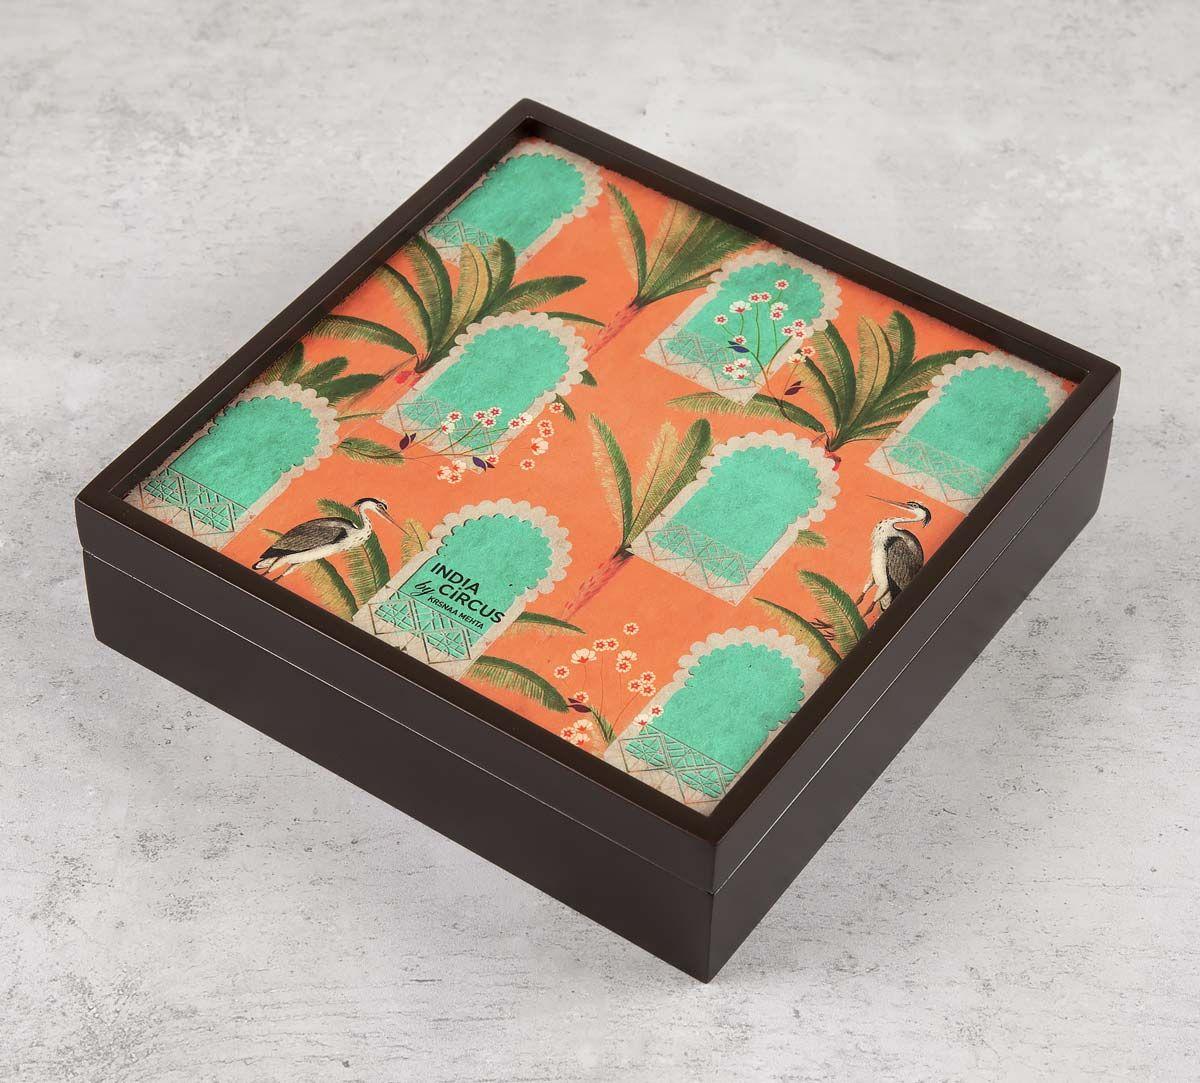 India Circus Heron's Palace Storage Box